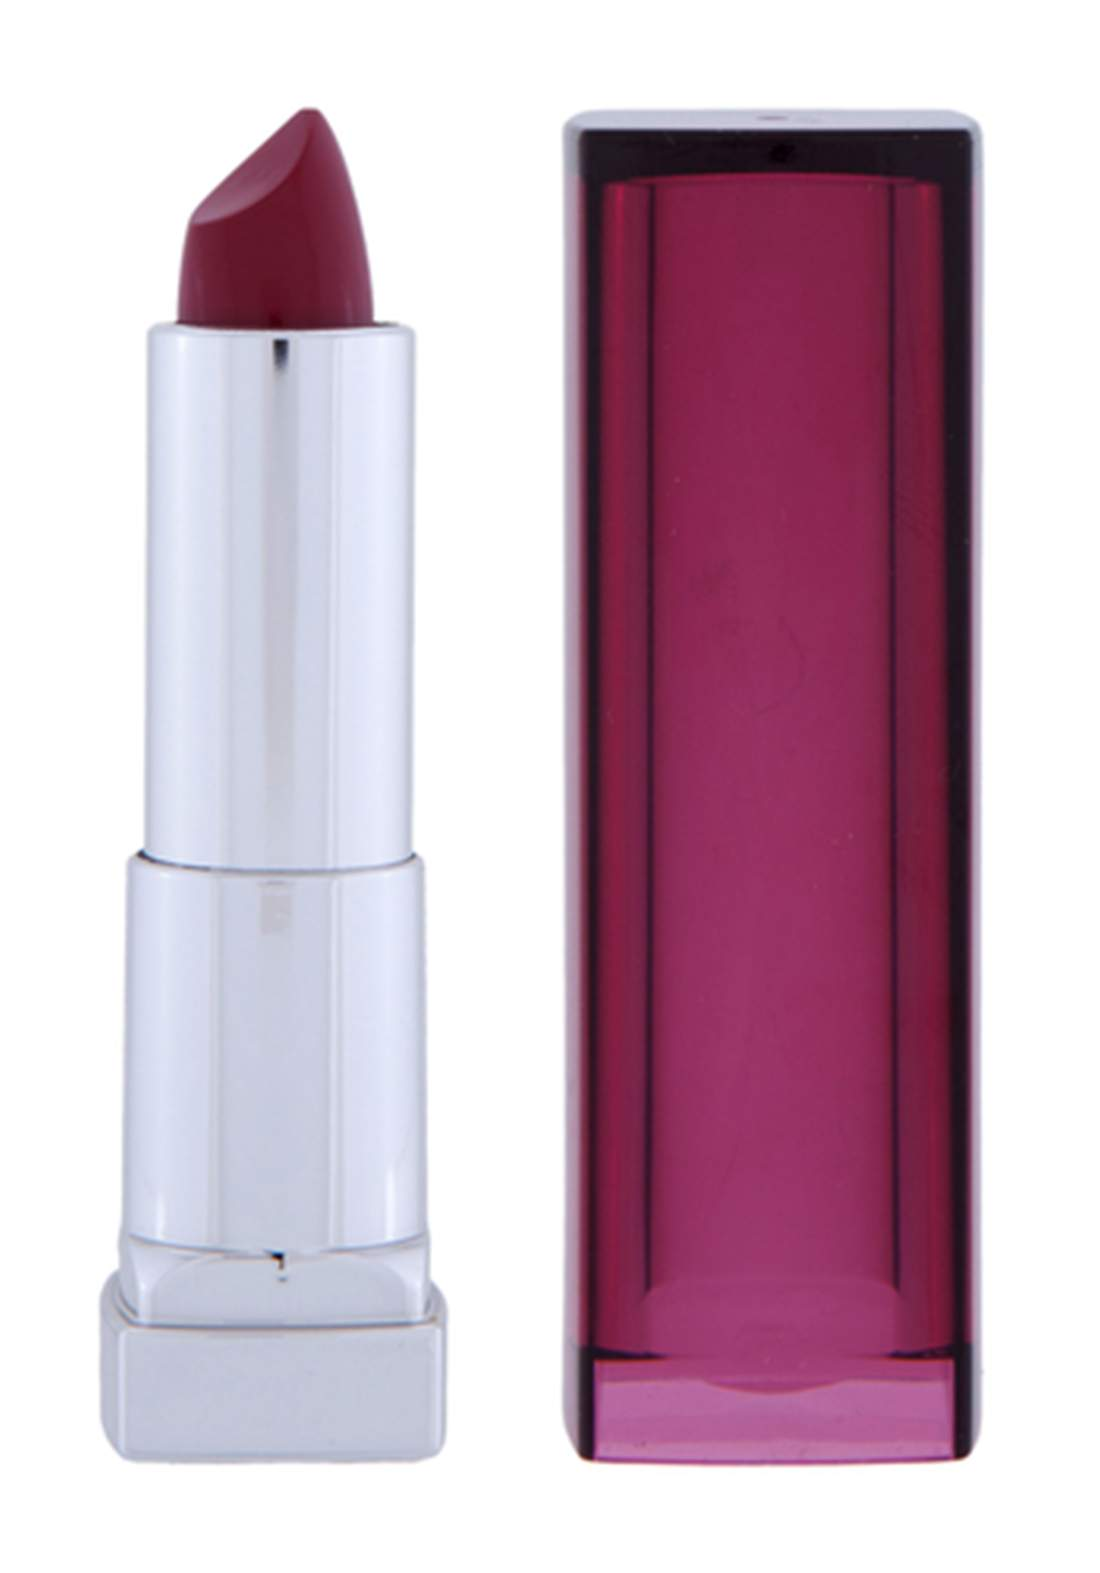 (022-0051)Maybelline Color Sensational Atomic Pink lipstick Red 190 احمر شفاه